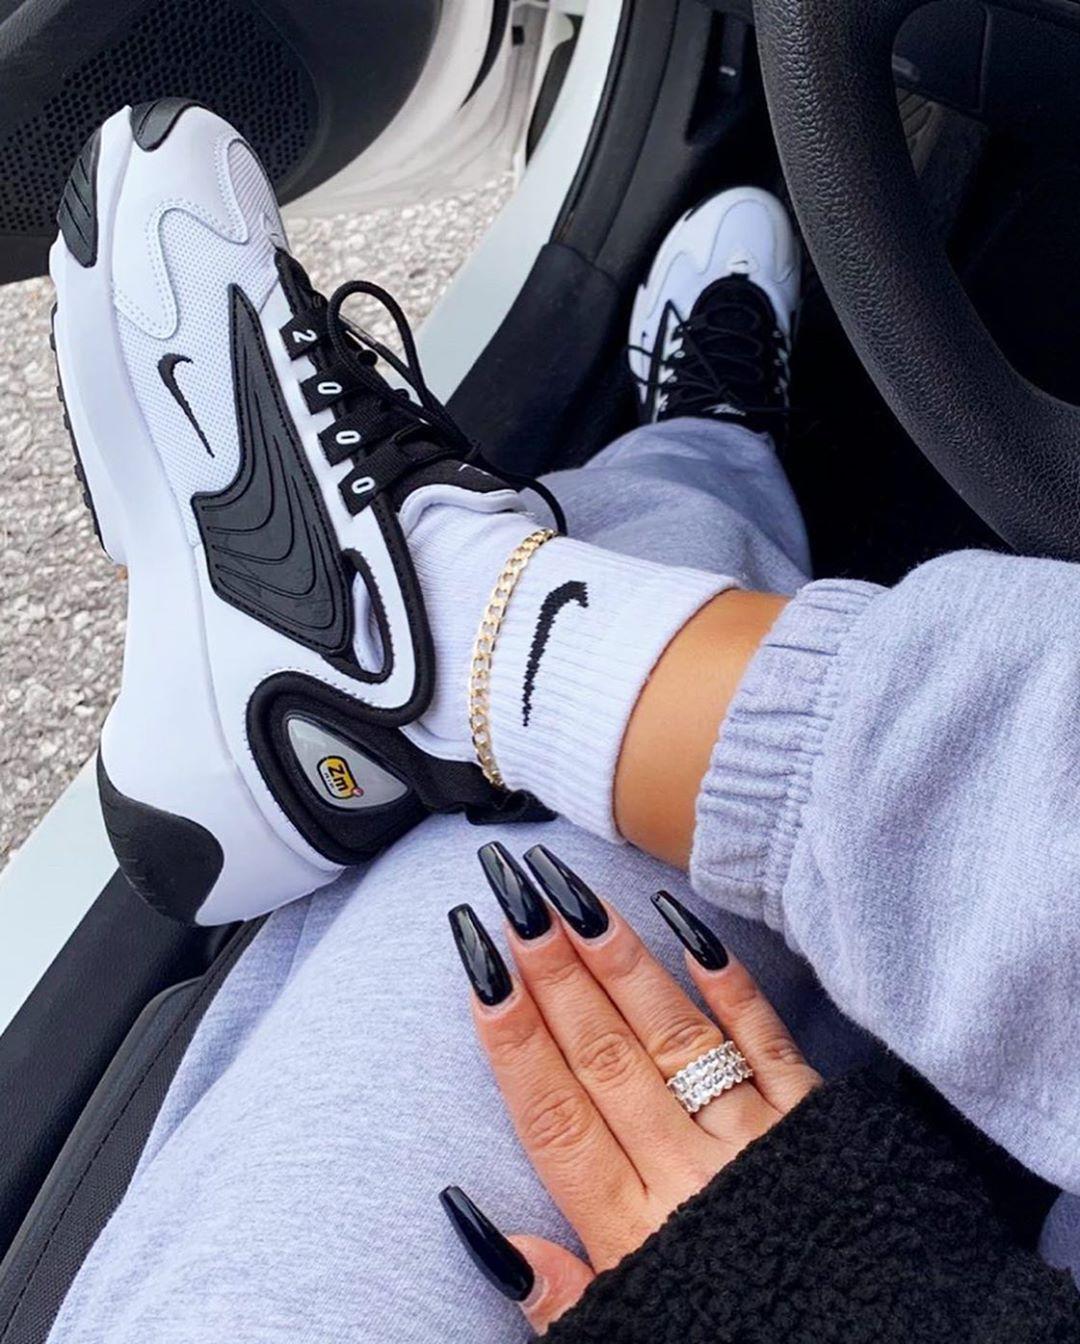 ingresos temperatura desbloquear  Pin en foot nails